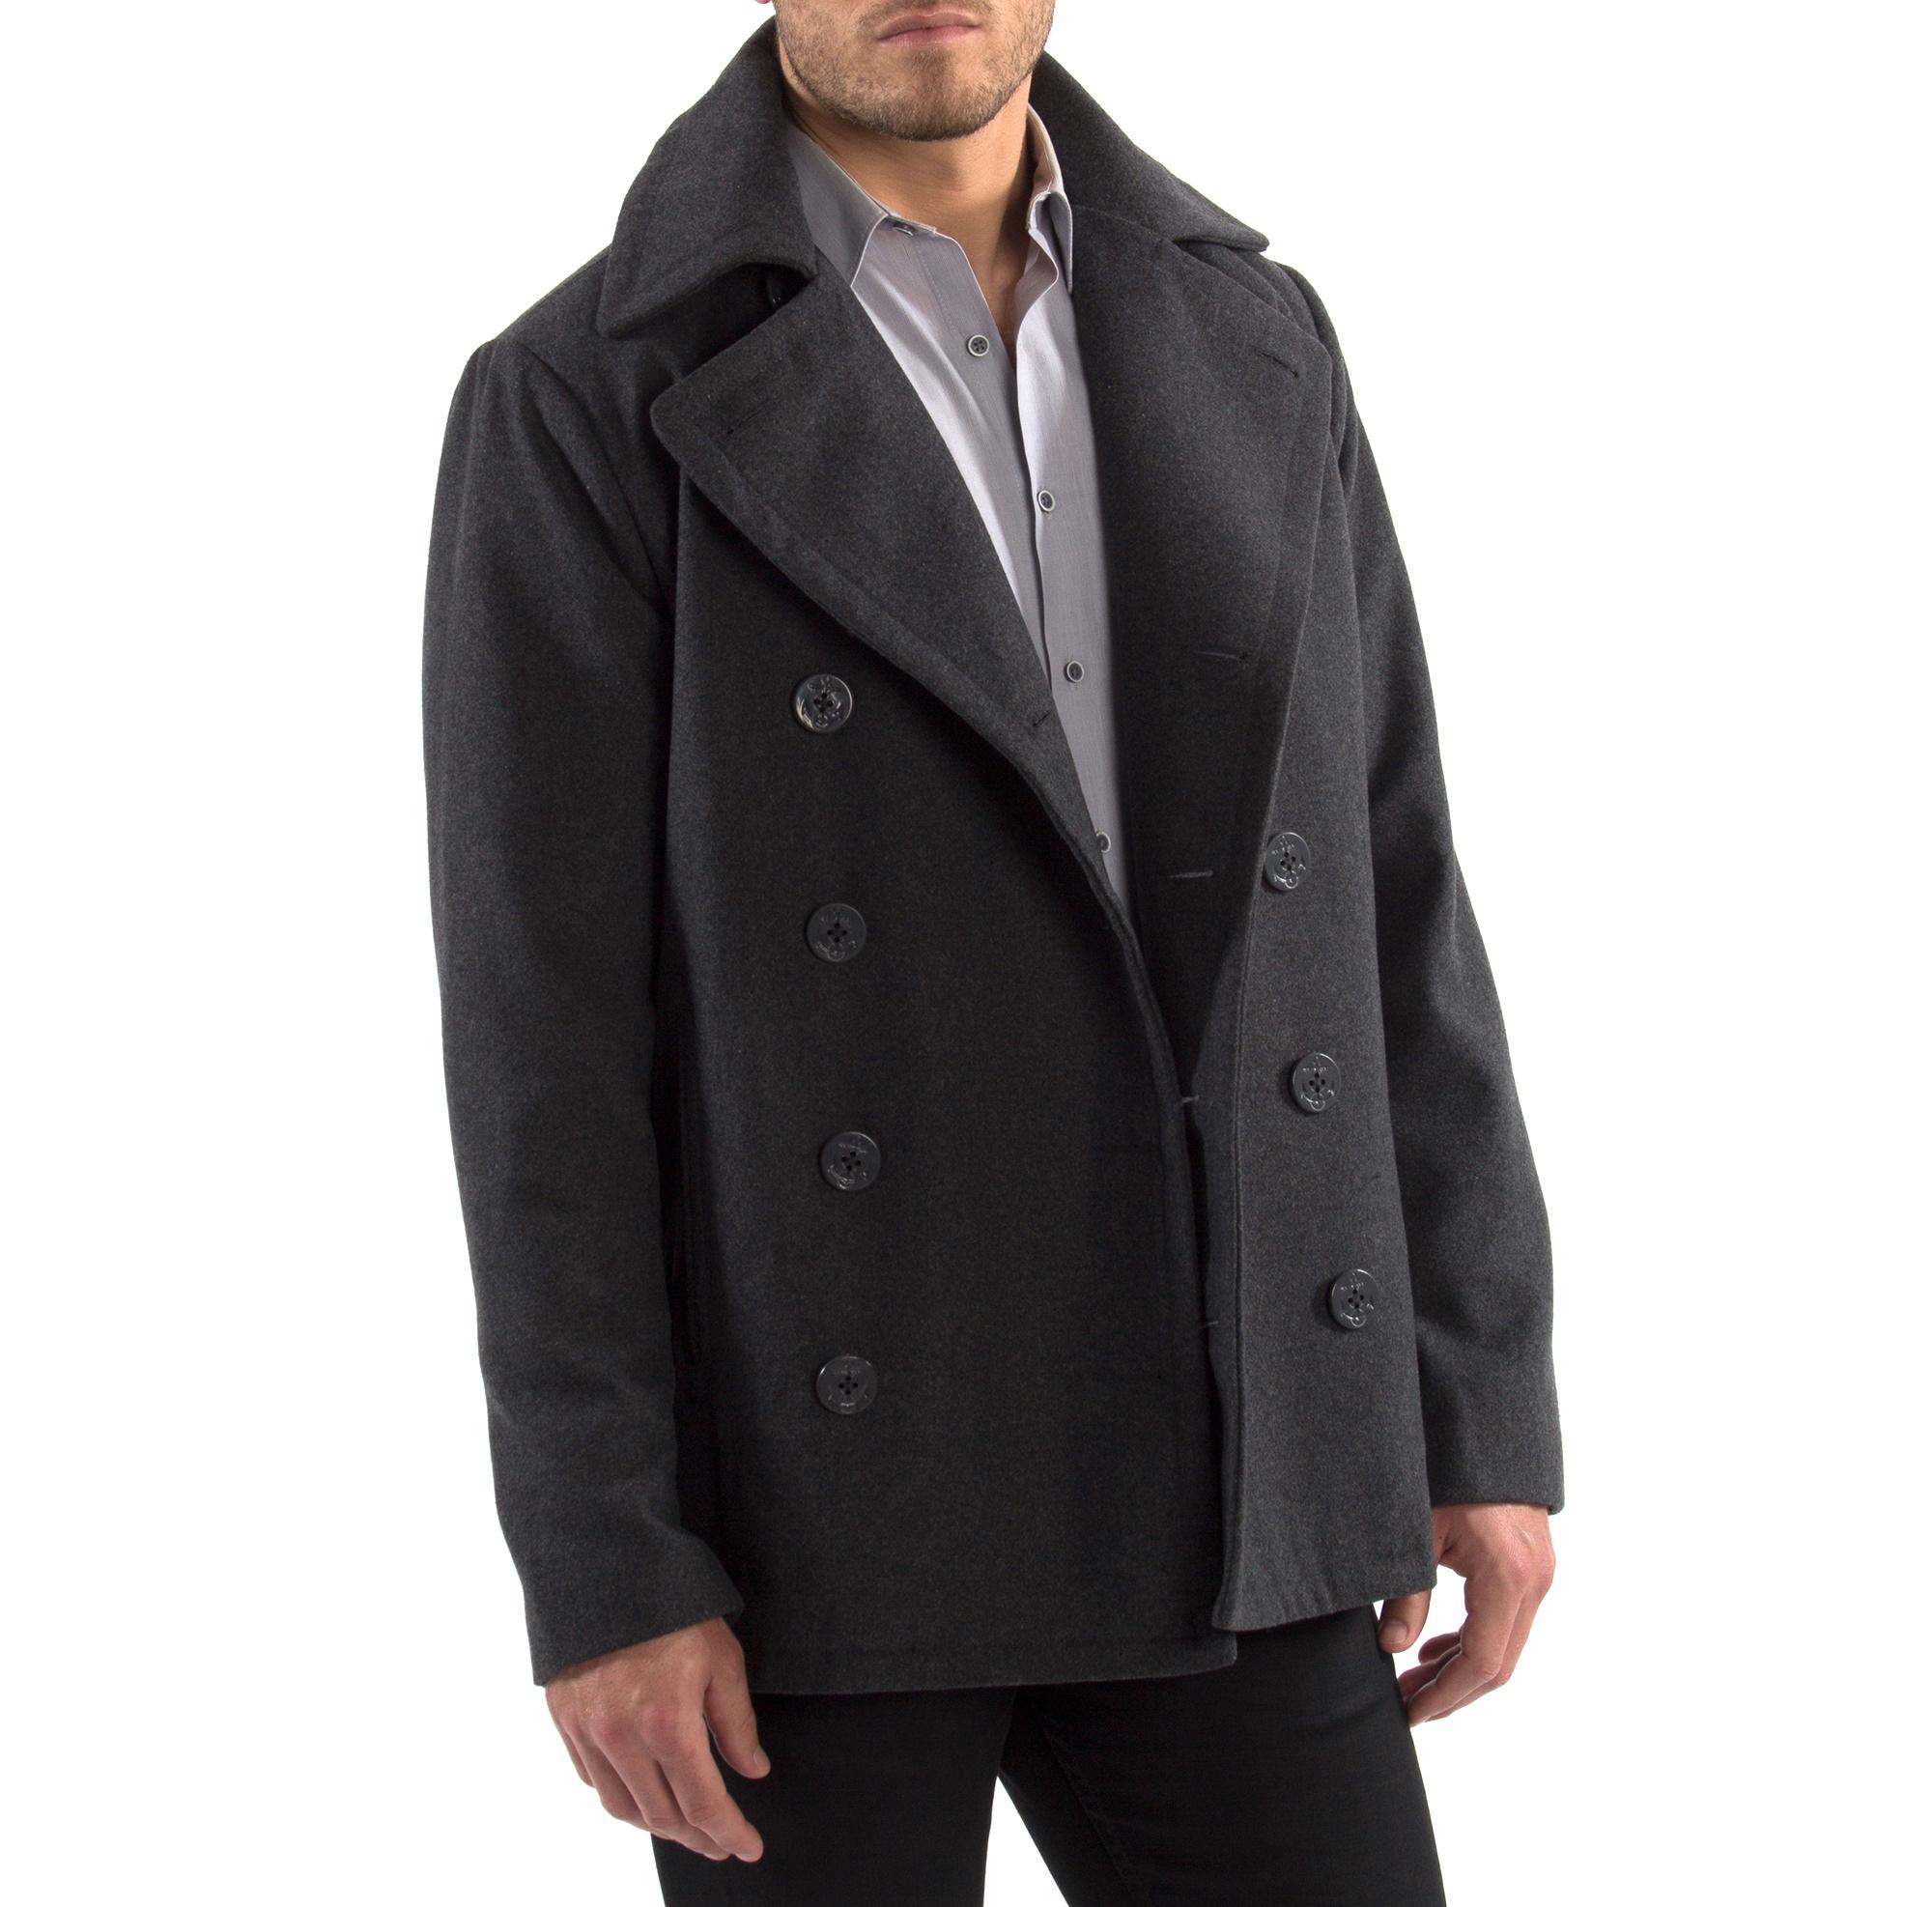 Alpine-Swiss-Mason-Mens-Wool-Blend-Pea-Coat-Jacket-Double-Breasted-Dress-Coat thumbnail 25